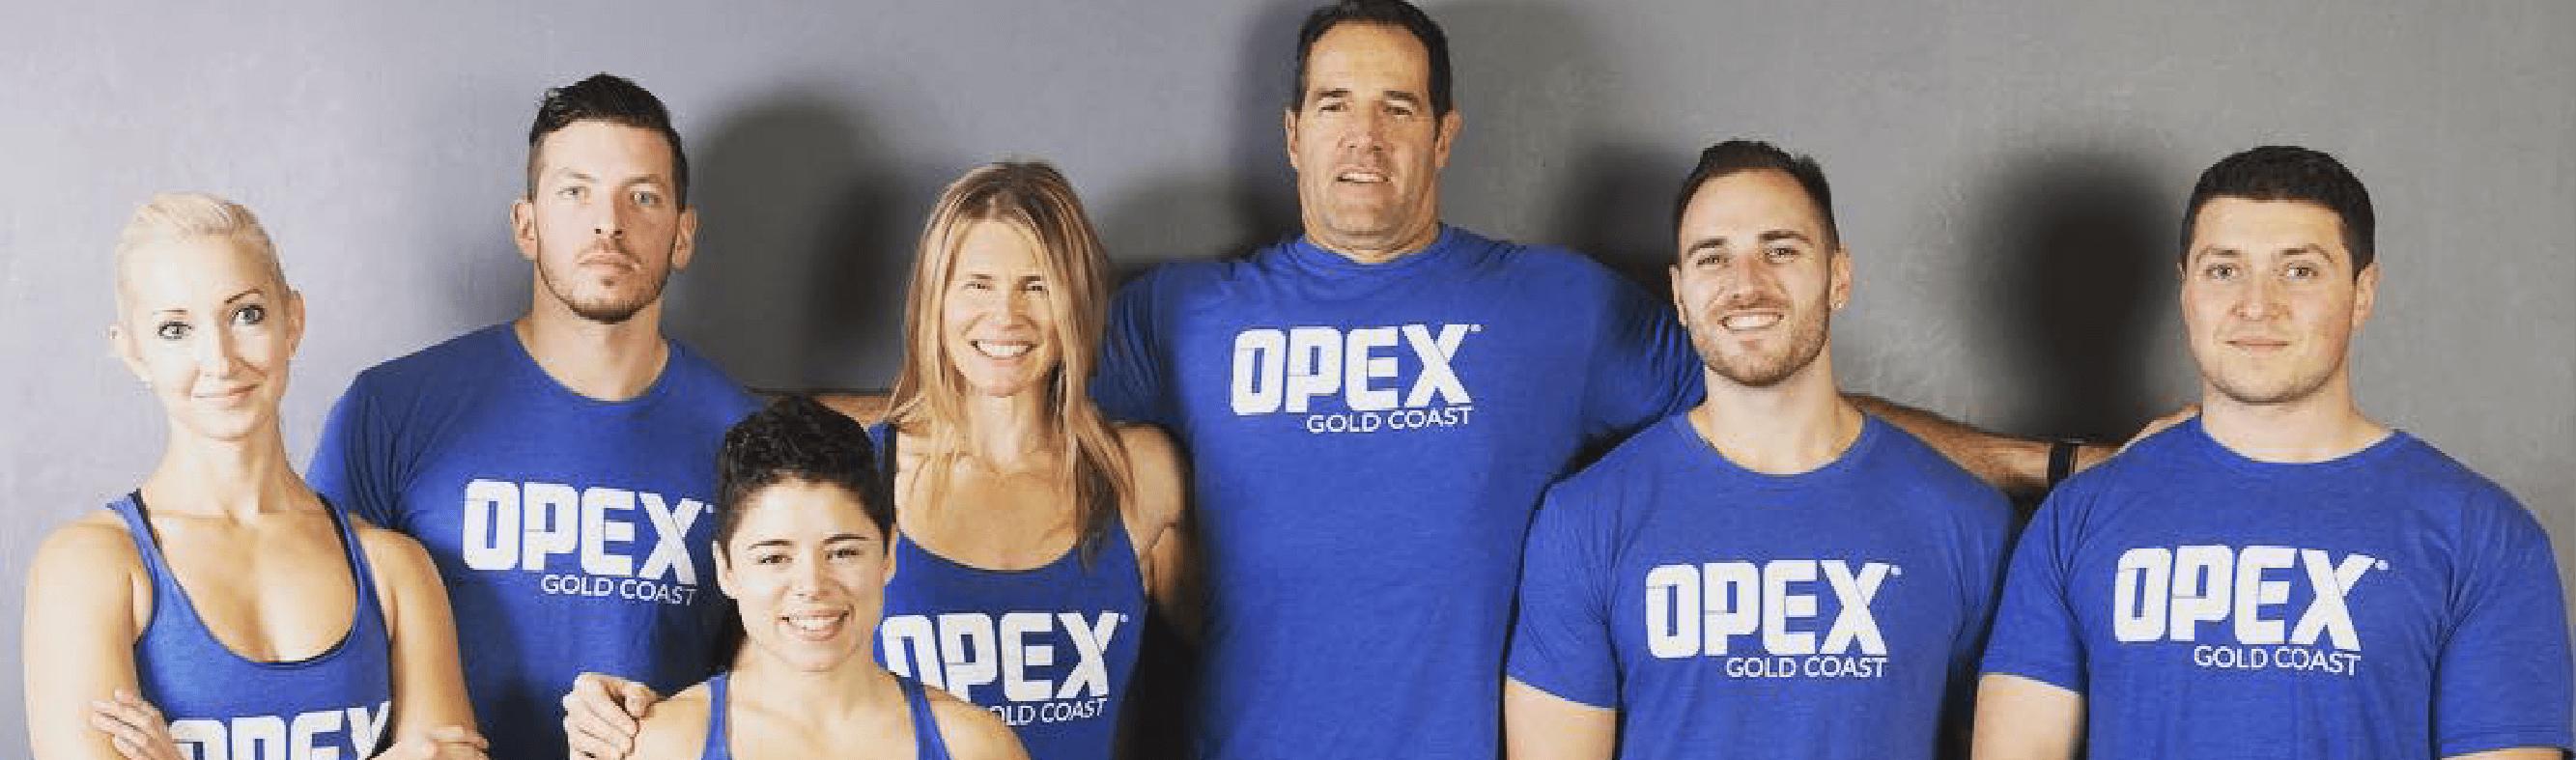 Jim and Julie Migliaccio of OPEX Gold Coast